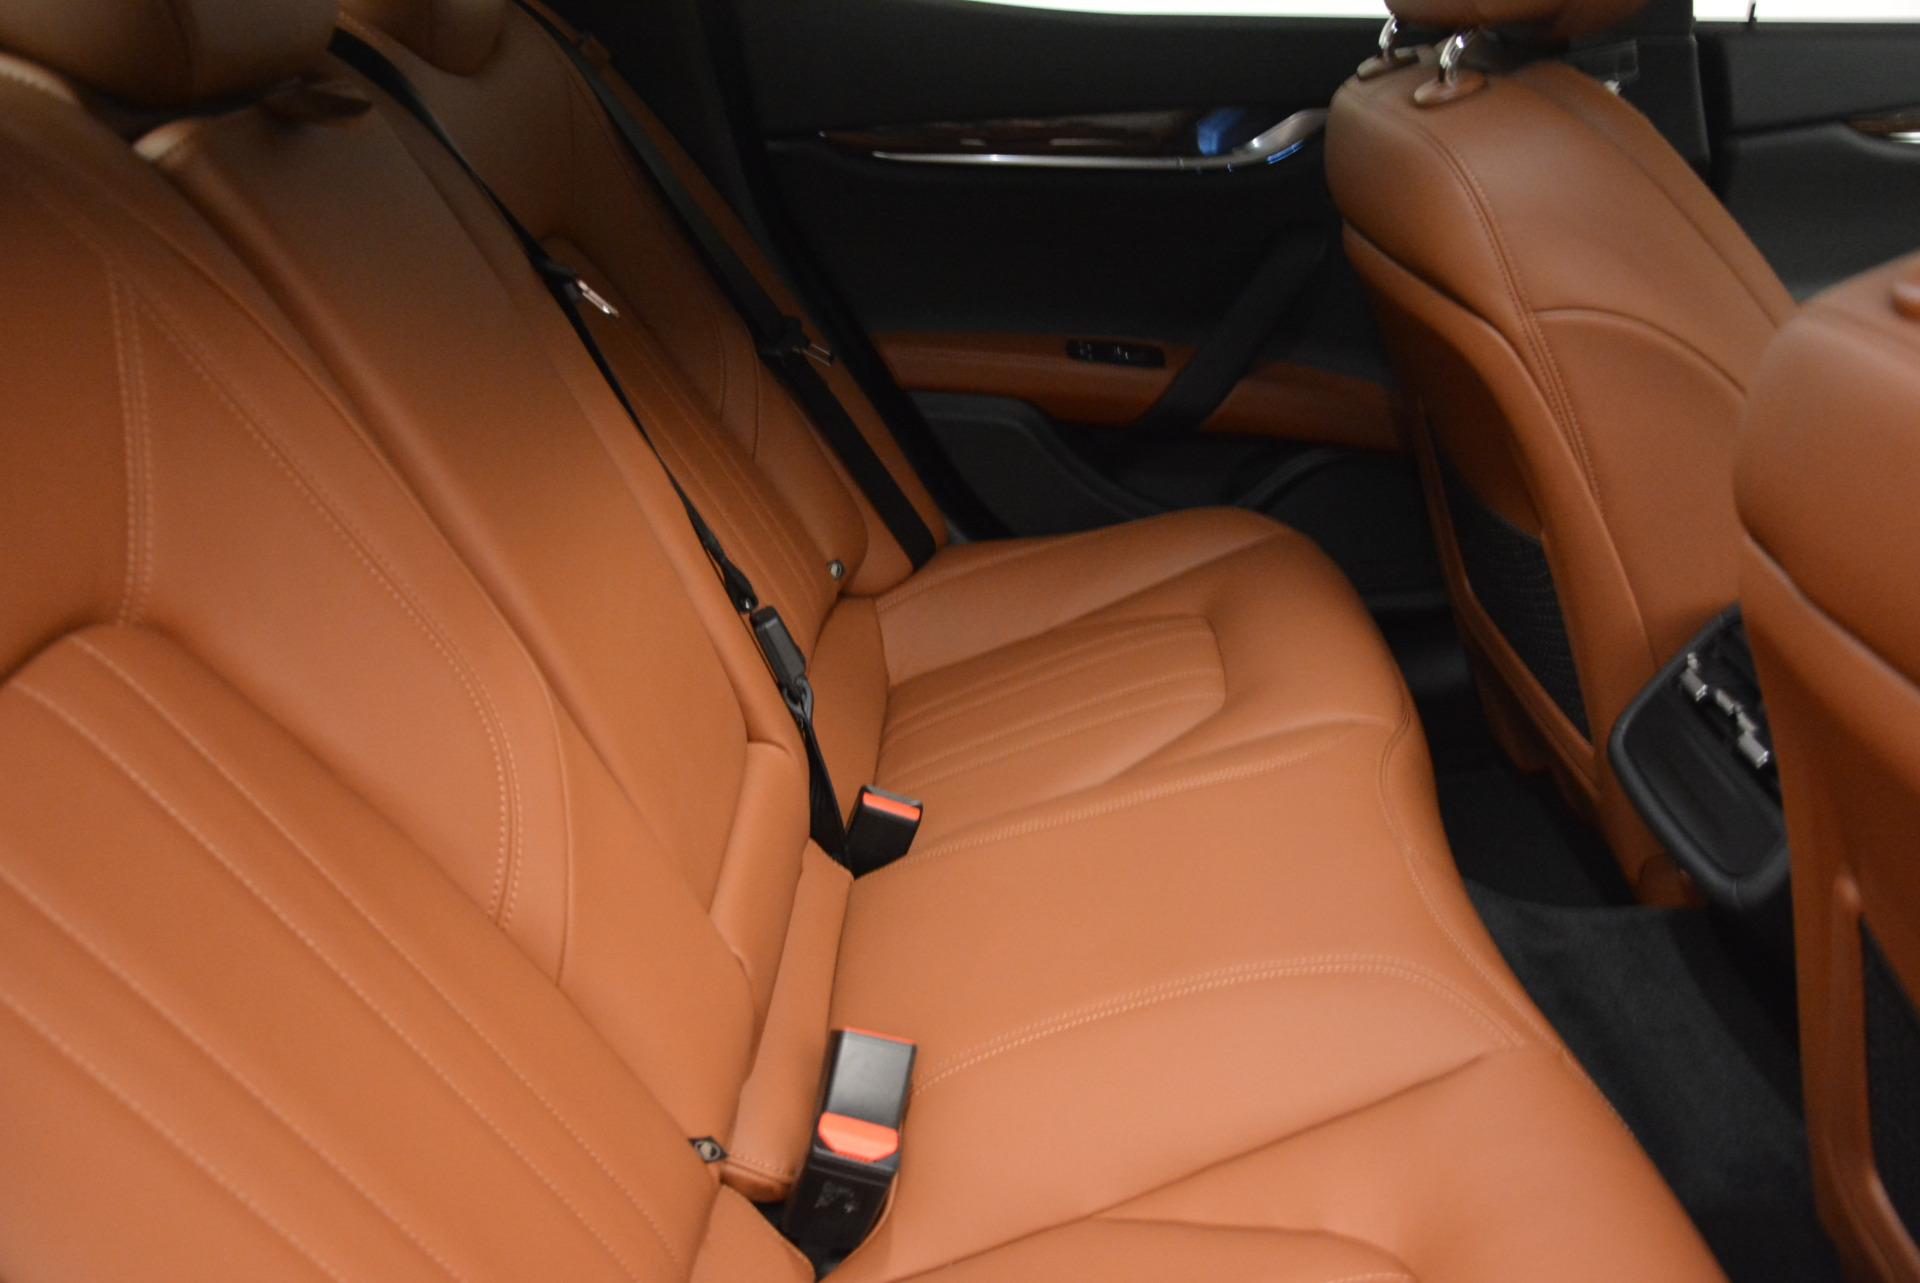 Used 2017 Maserati Ghibli S Q4  EX-LOANER For Sale In Westport, CT 565_p23